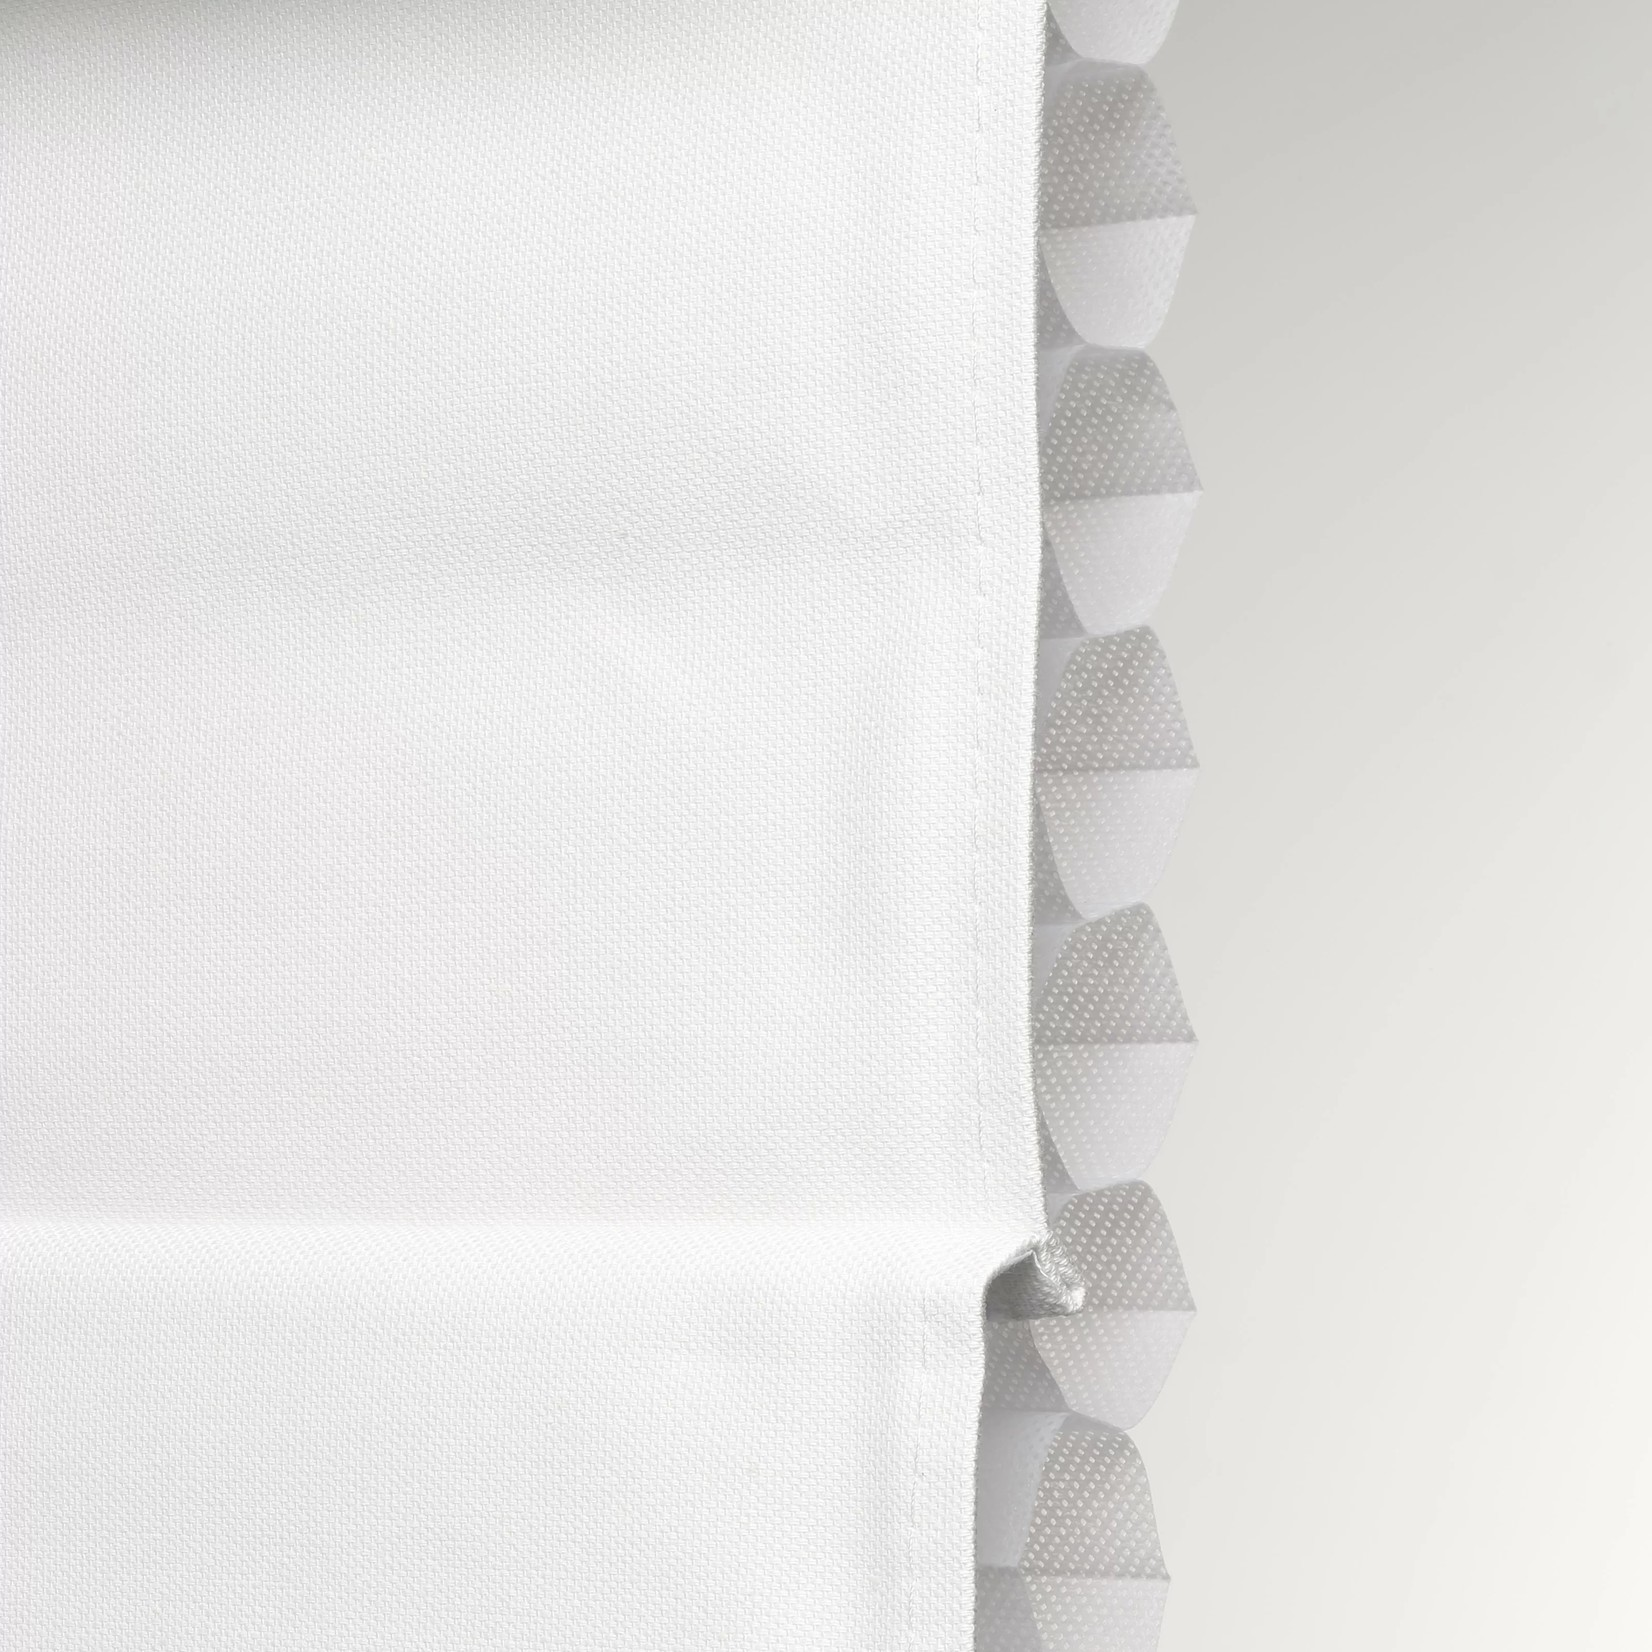 "*Insulating Cordless Blackout Roman Shade - White - 31"" x 72"" - Final Sale"